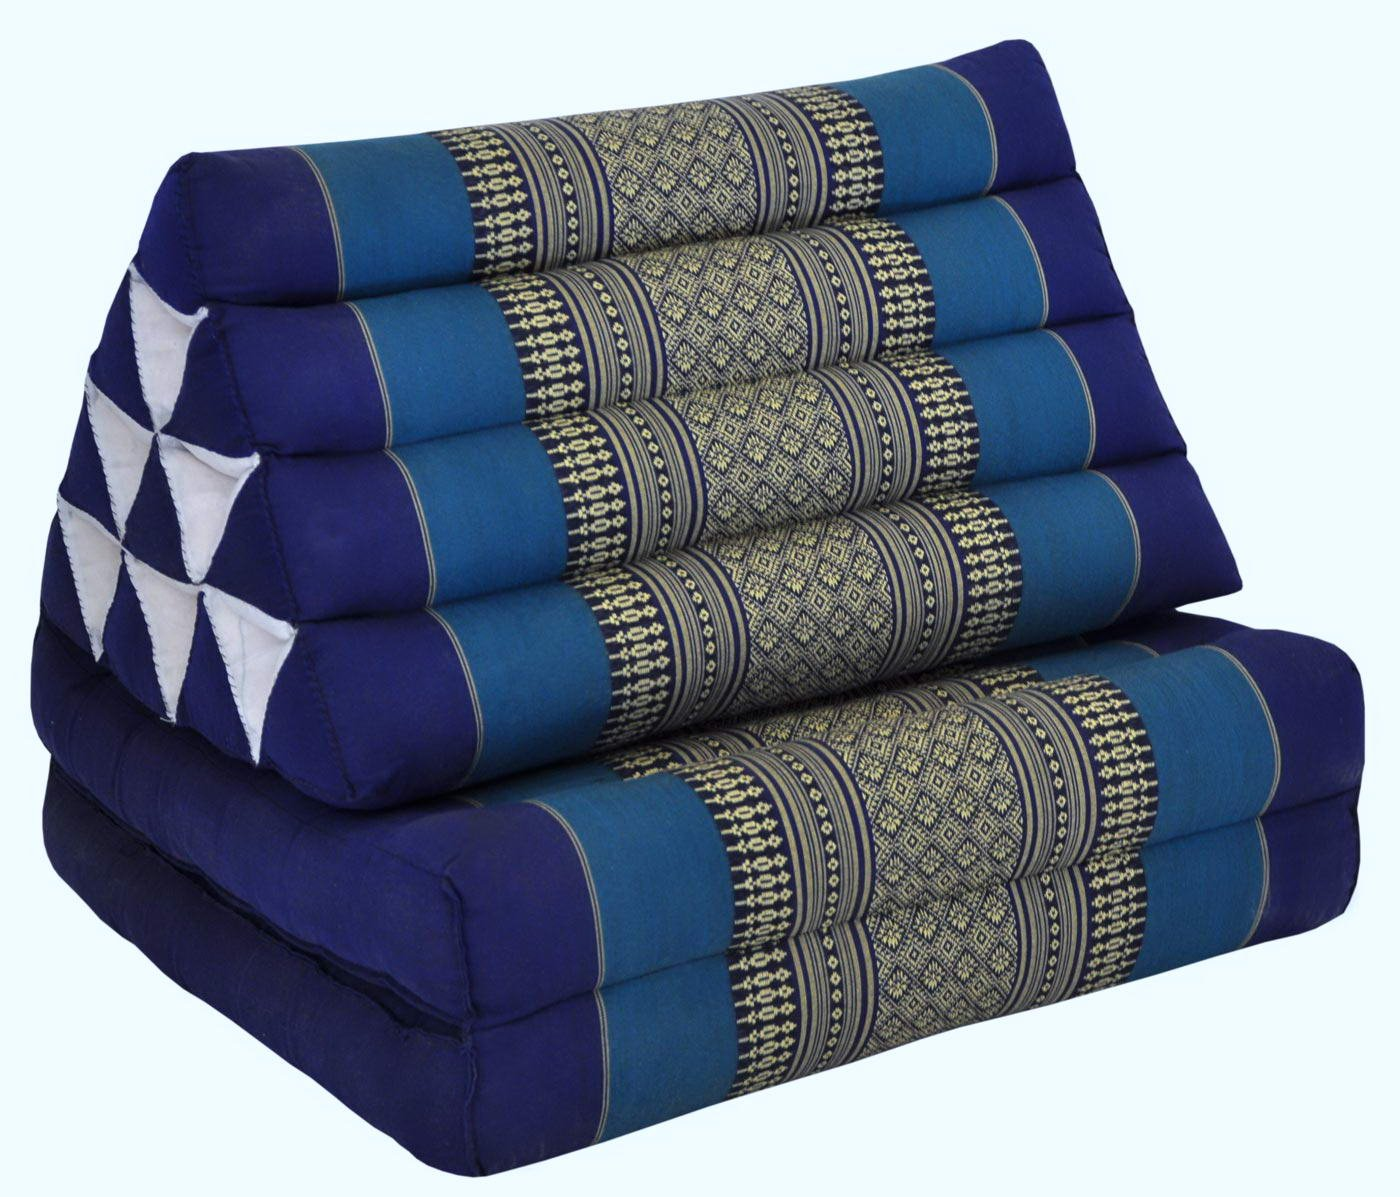 Thai triangular cushion with mattress 2 folds, blue, relaxation, beach, pool, meditation garden (82202) by Wilai GmbH